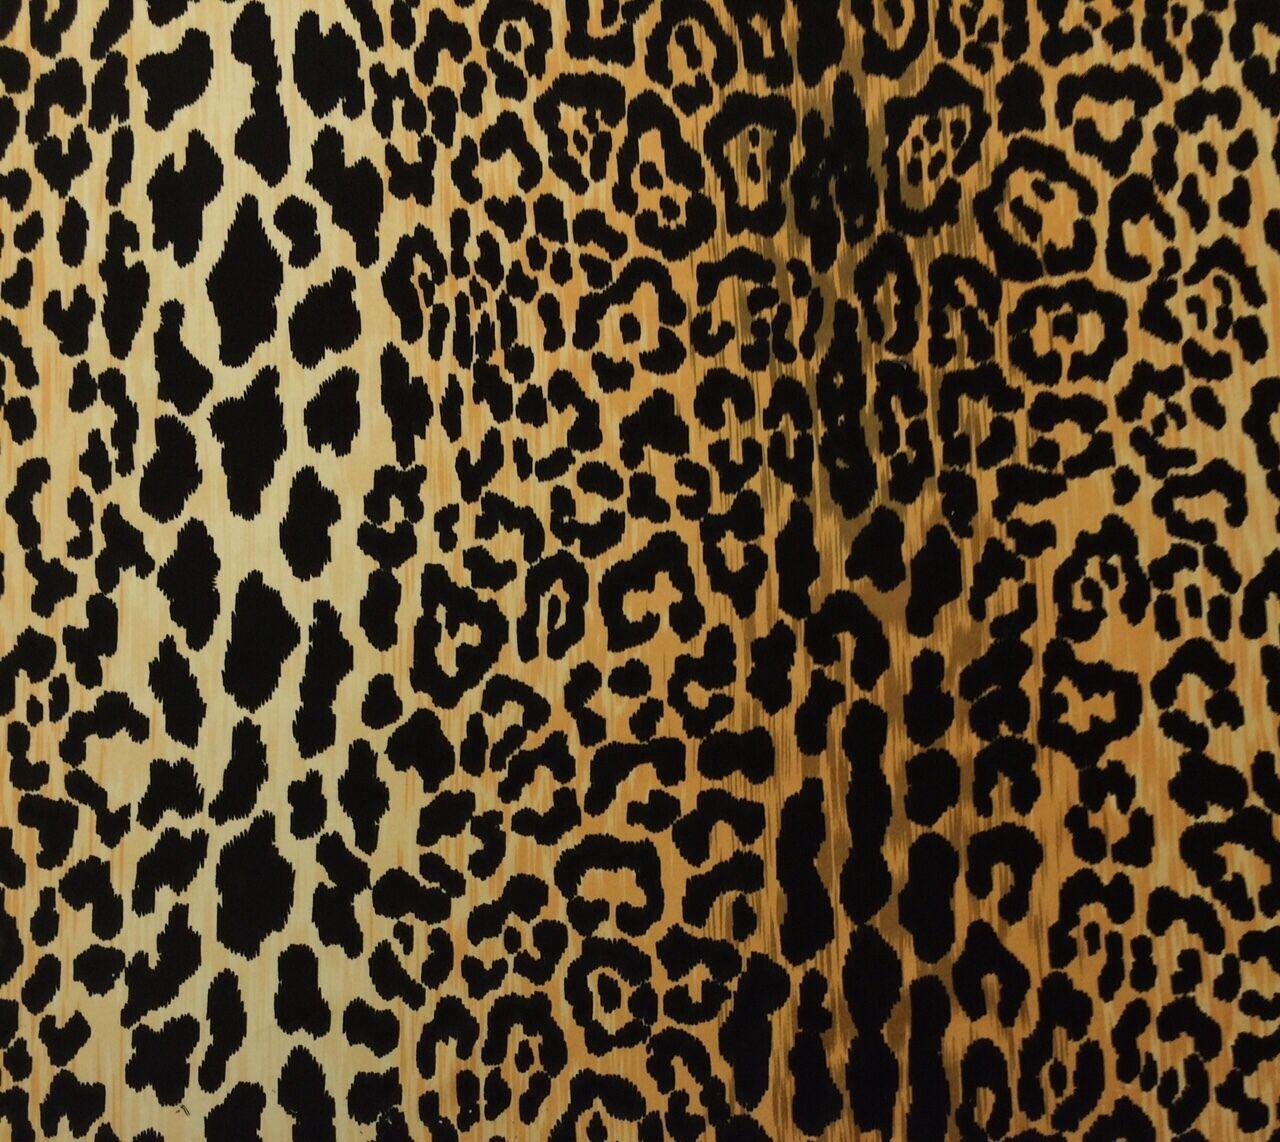 ballard designs serengeti camel leopard velvet jamil natural ballard designs serengeti camel leopard velvet jamil natural